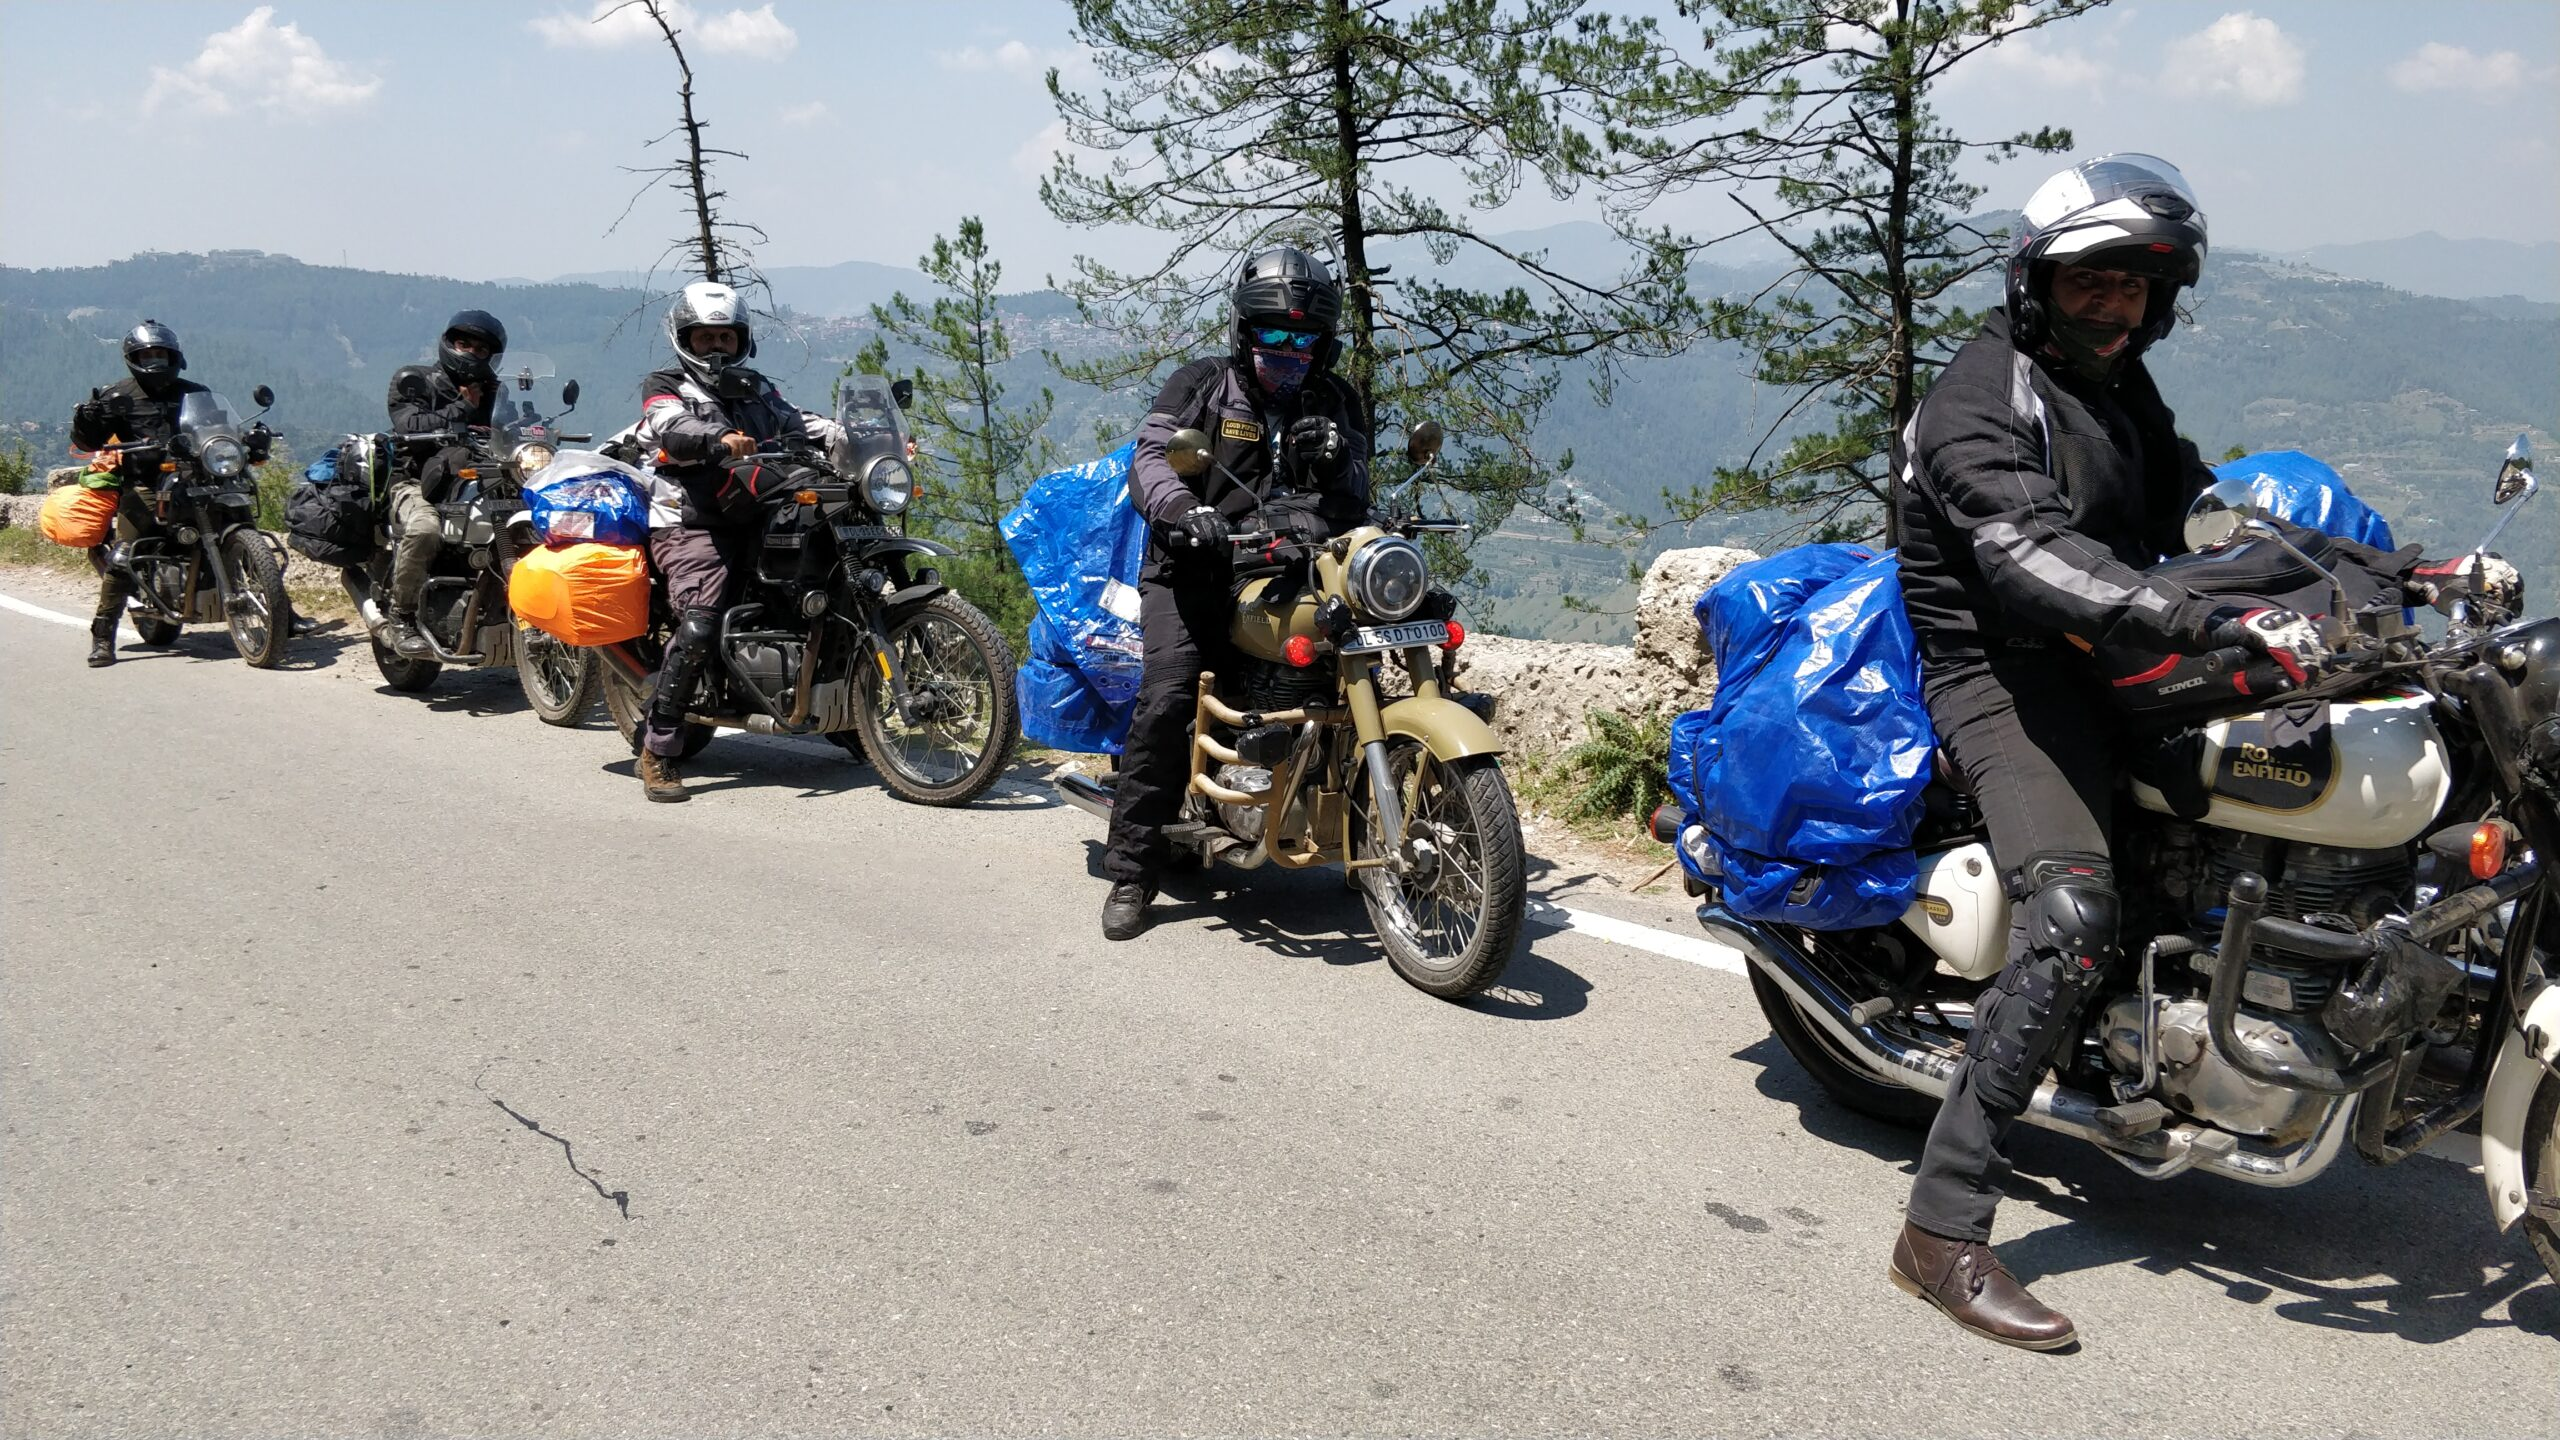 Srinagar Leh Manali Bike Trip | Leh Ladakh Bike Trip Packages | Kaizen Adventours